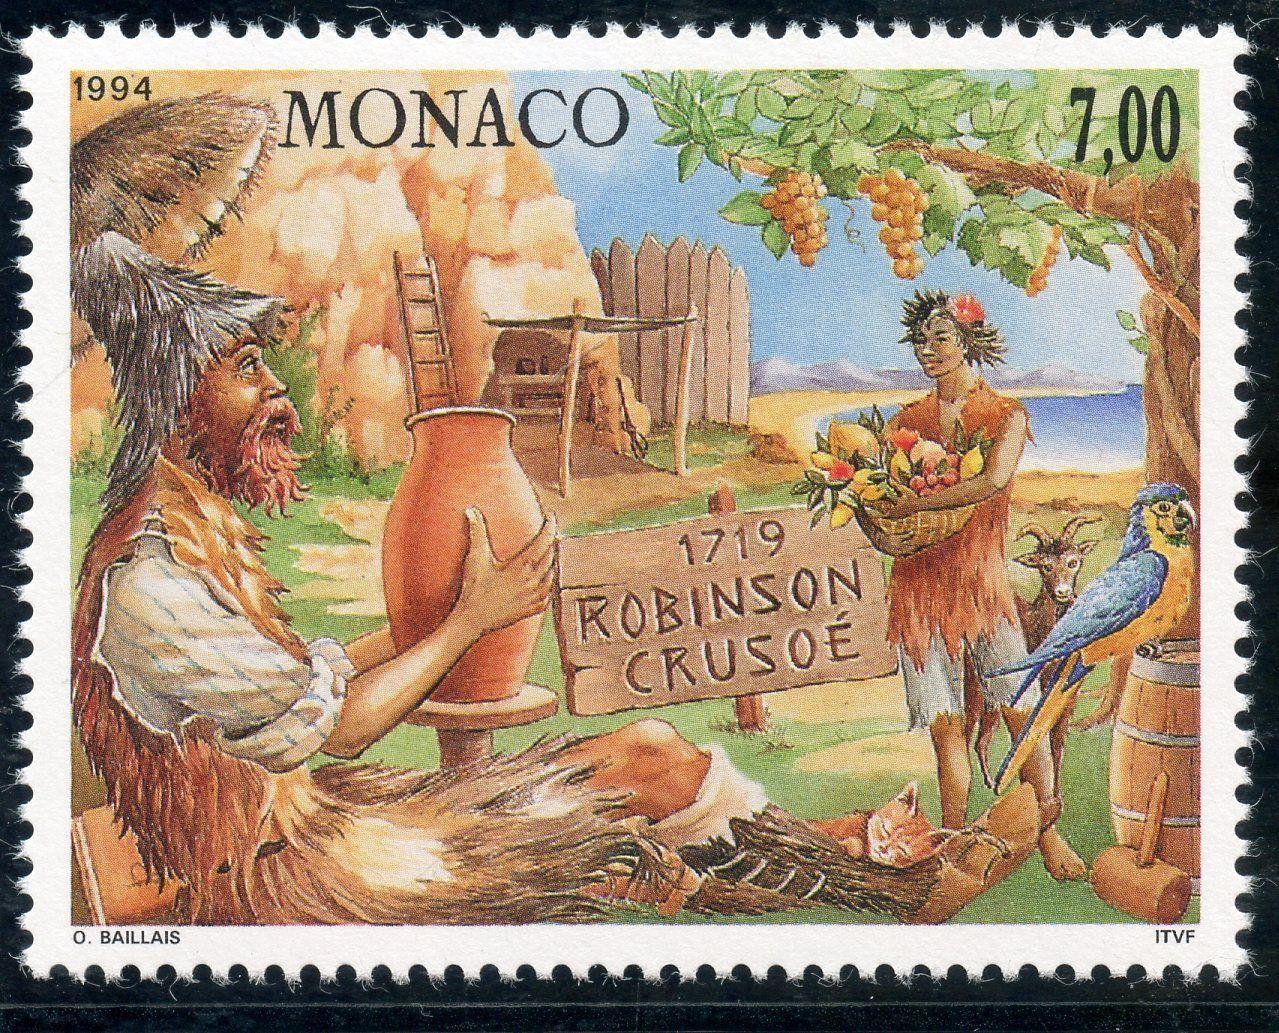 Monaco - Scott #1932 (1993) marking the 275th anniversary of the publication of Robinson Crusoe by Daniel Defoe